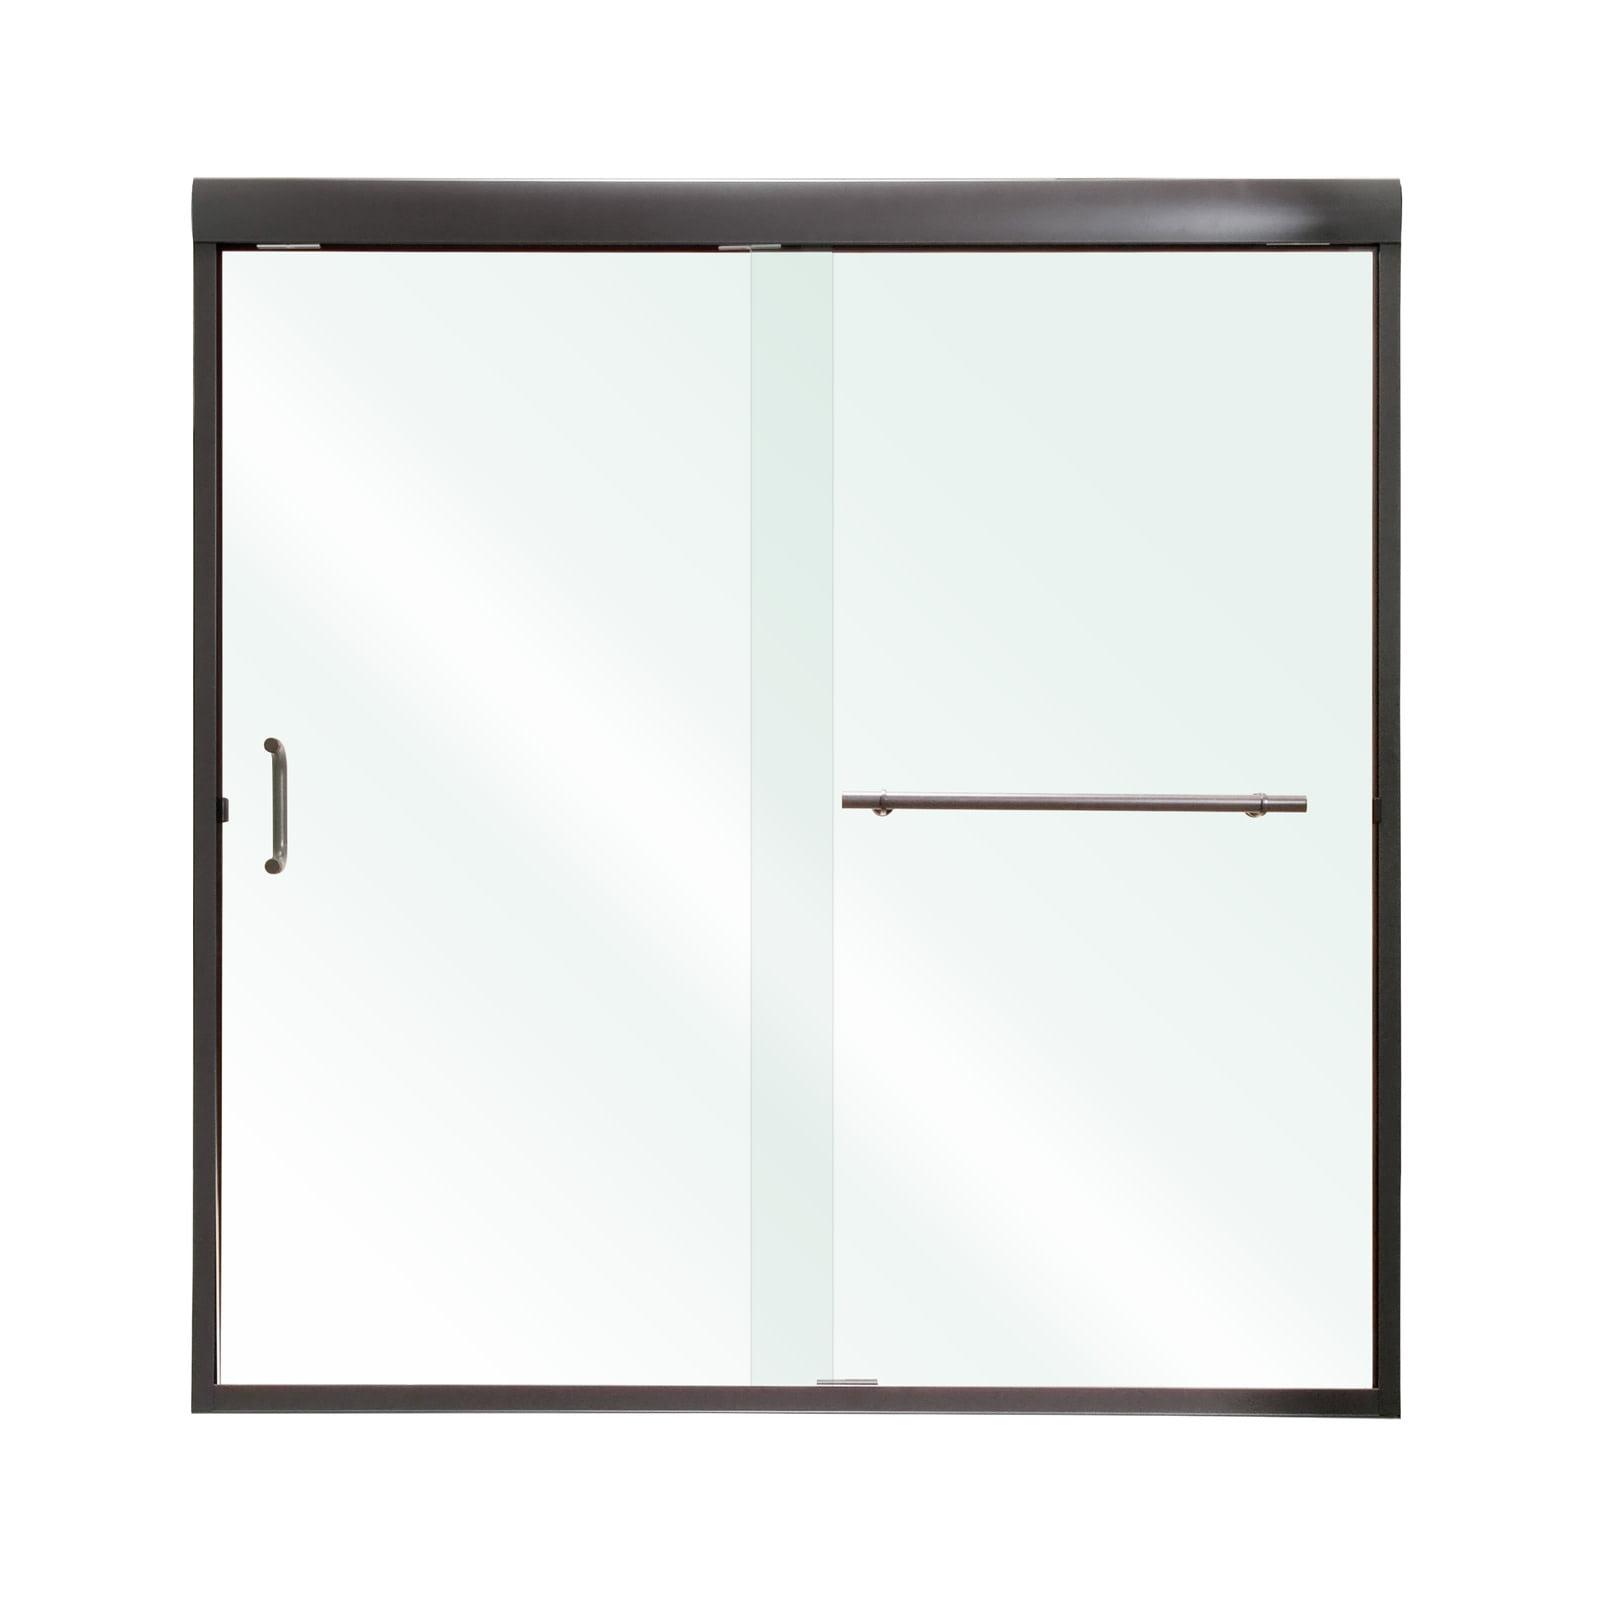 Miseno Msdc6060 Azul 60 High X 60 Wide Semi Framed Shower